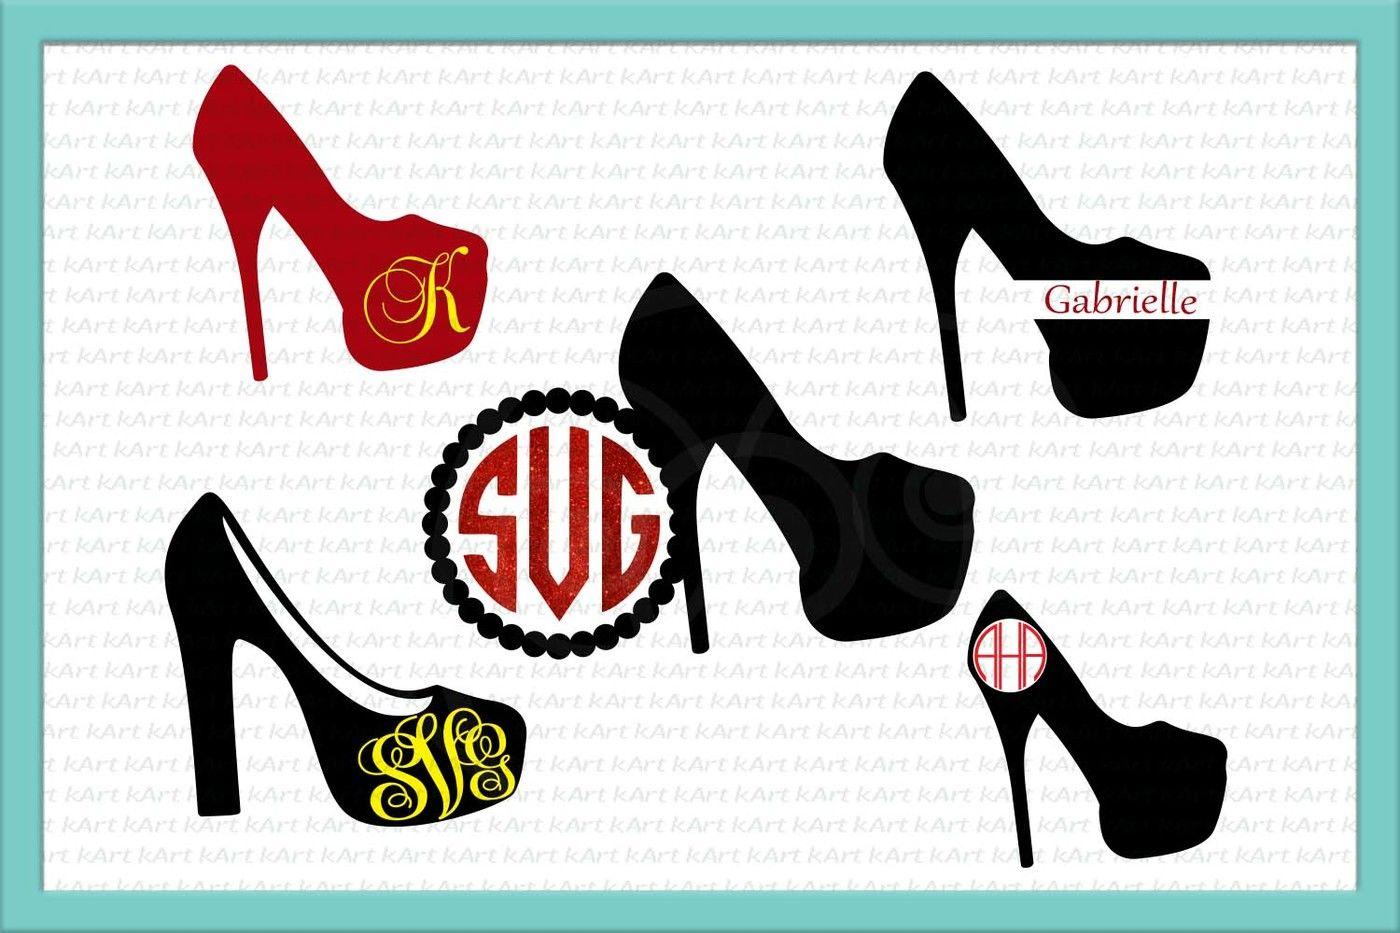 High Heel Svg High Heel Monogram Svg High Heels Svg Bundle Svg High Heel Clipart Woman Shoe Svg Monogram Svg High Heel Silhouette Dxf By Kartcreation Thehungryjpeg Com